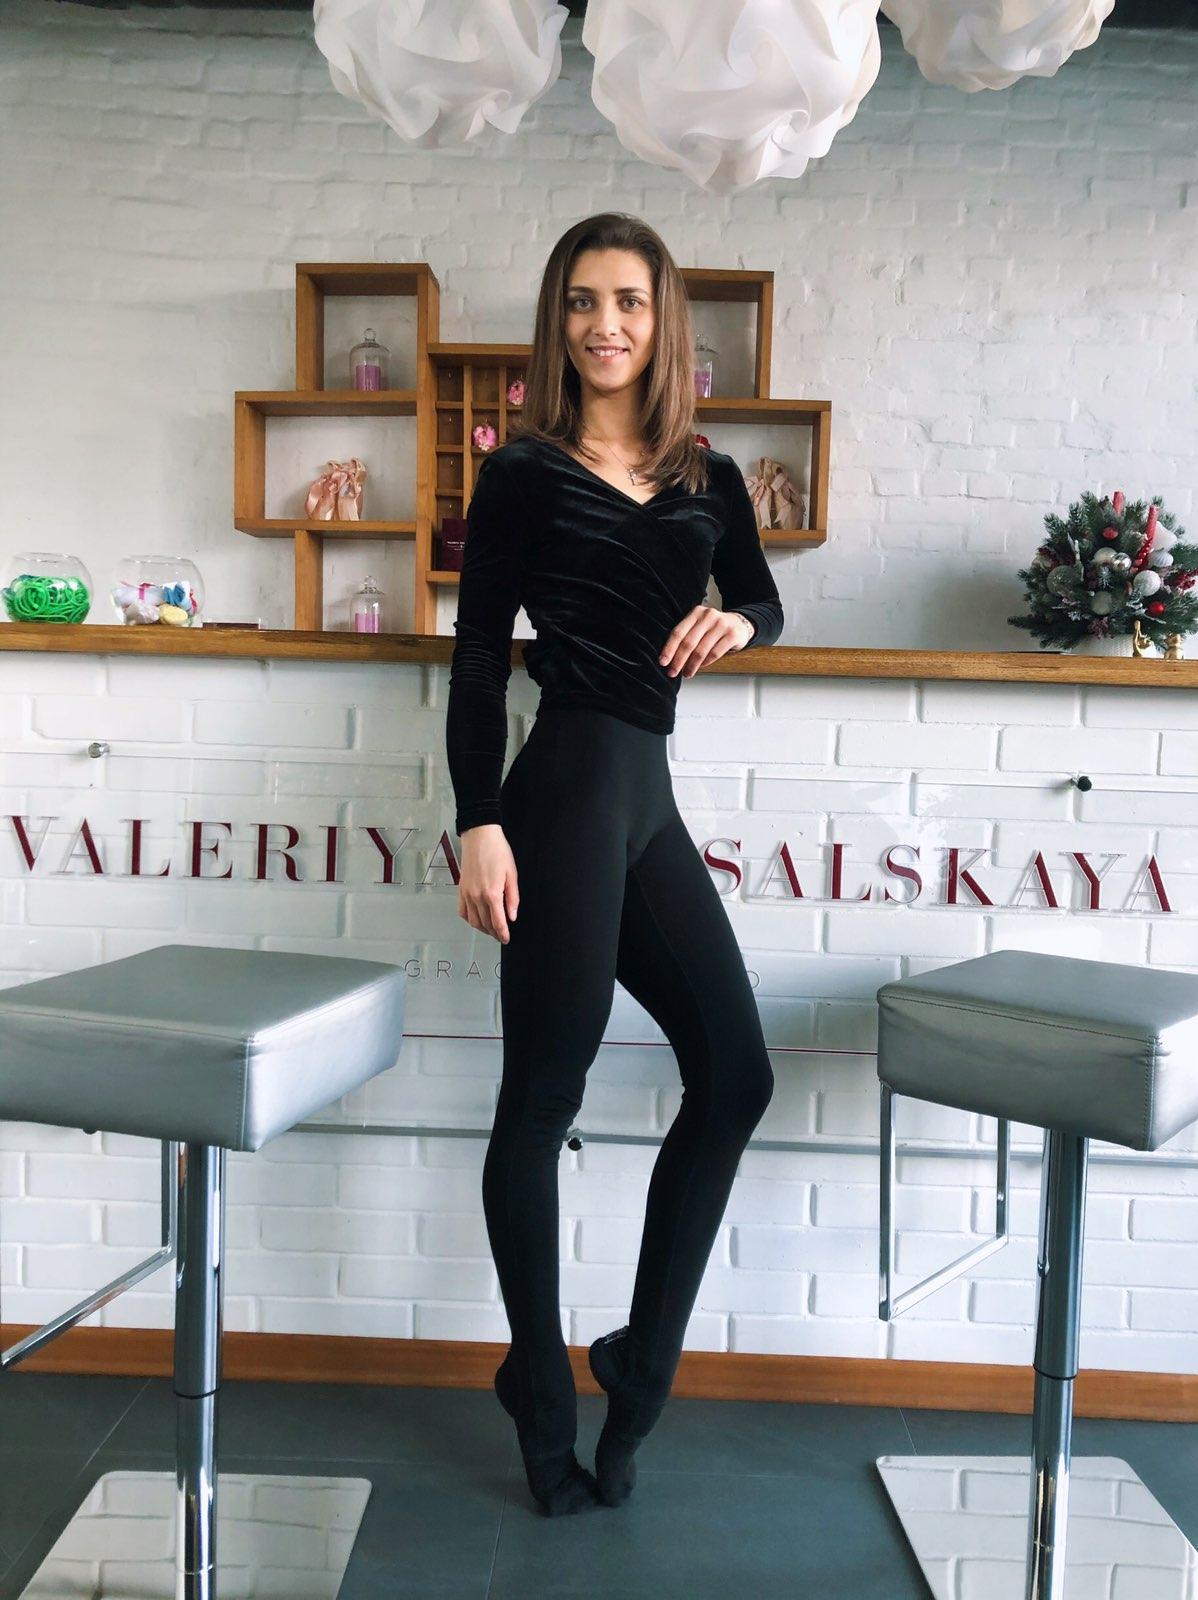 Глєбова Олександра (волейбол) - фітнес клуб Валерії Версальскої, фітнес-інструктор